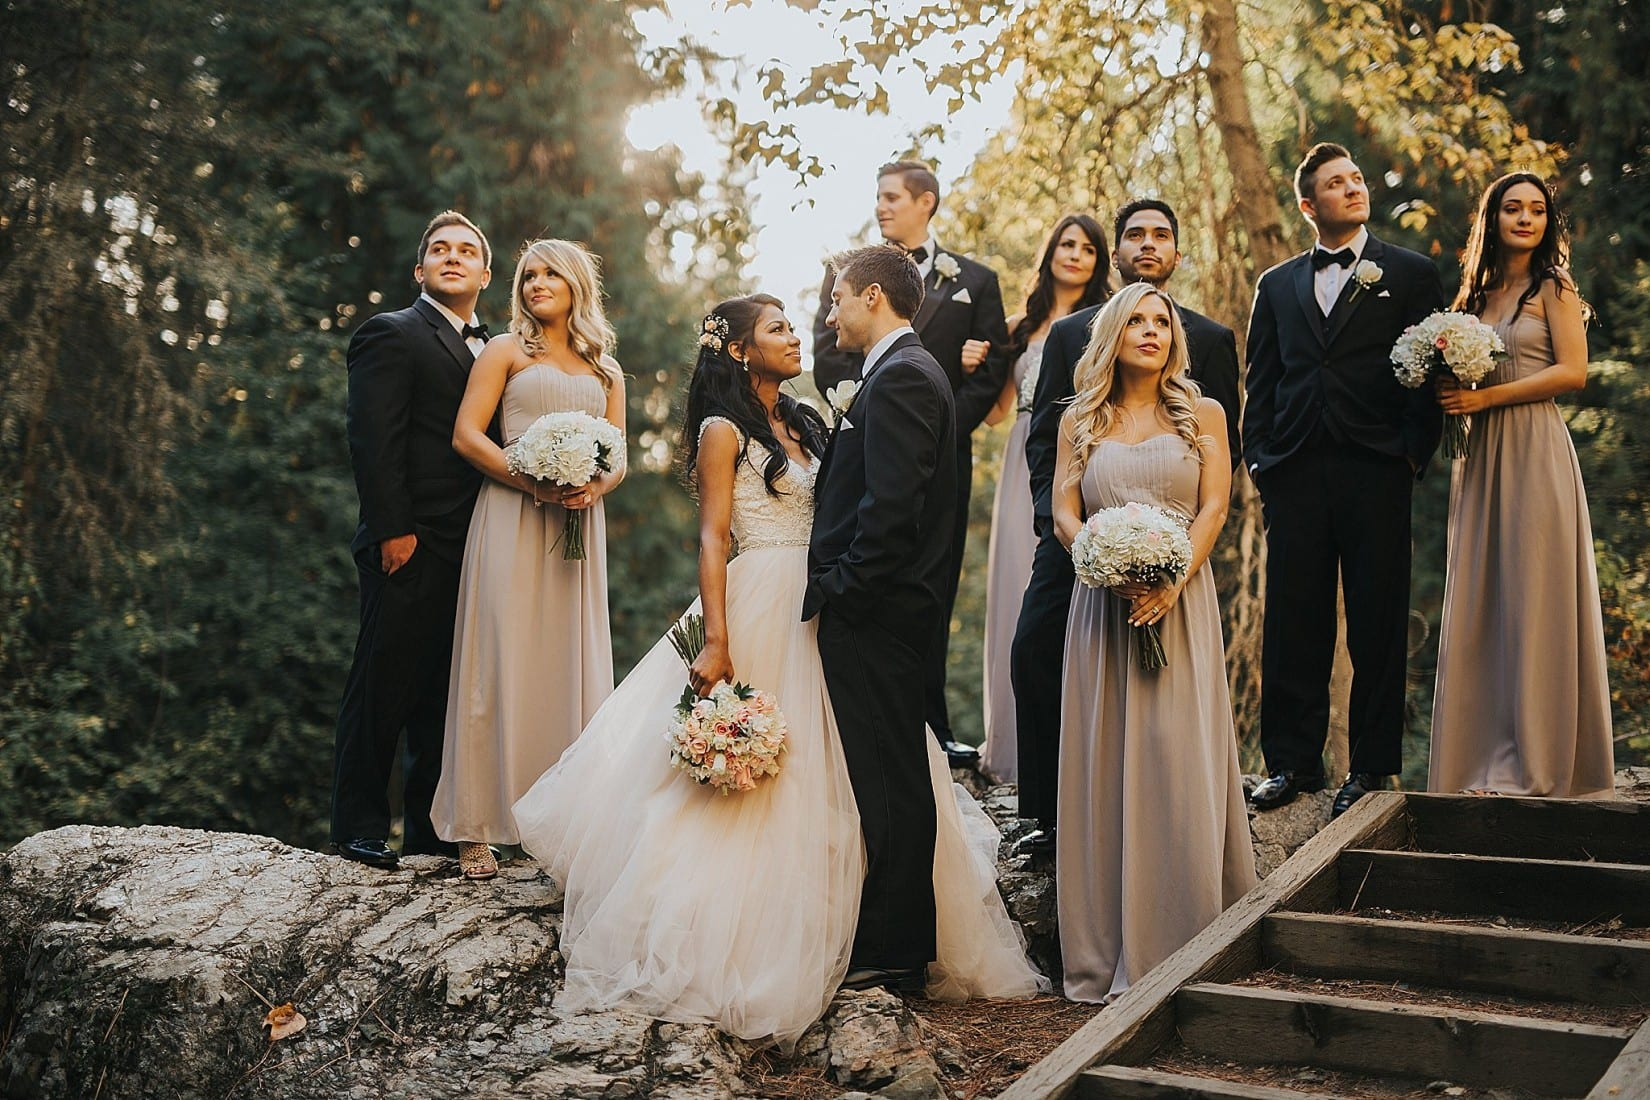 Looking for Kelowna's Best Wedding Photographer? Barnett Photography, winners of the Kelowna Now Best of Kelowna 2017, serving Kelowna, Vernon, Penticton!